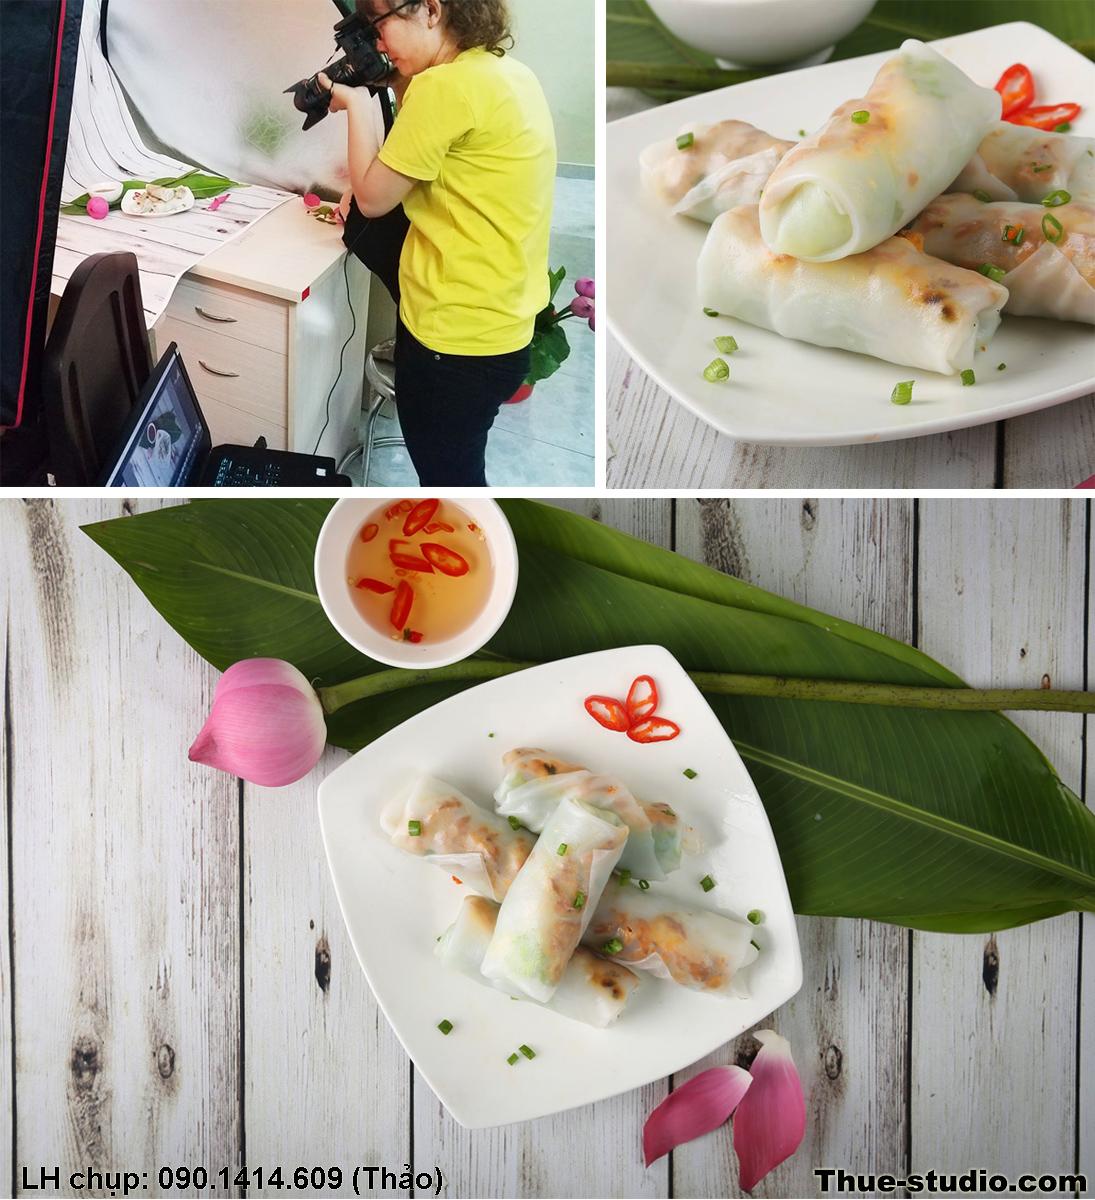 thue-studio chup food